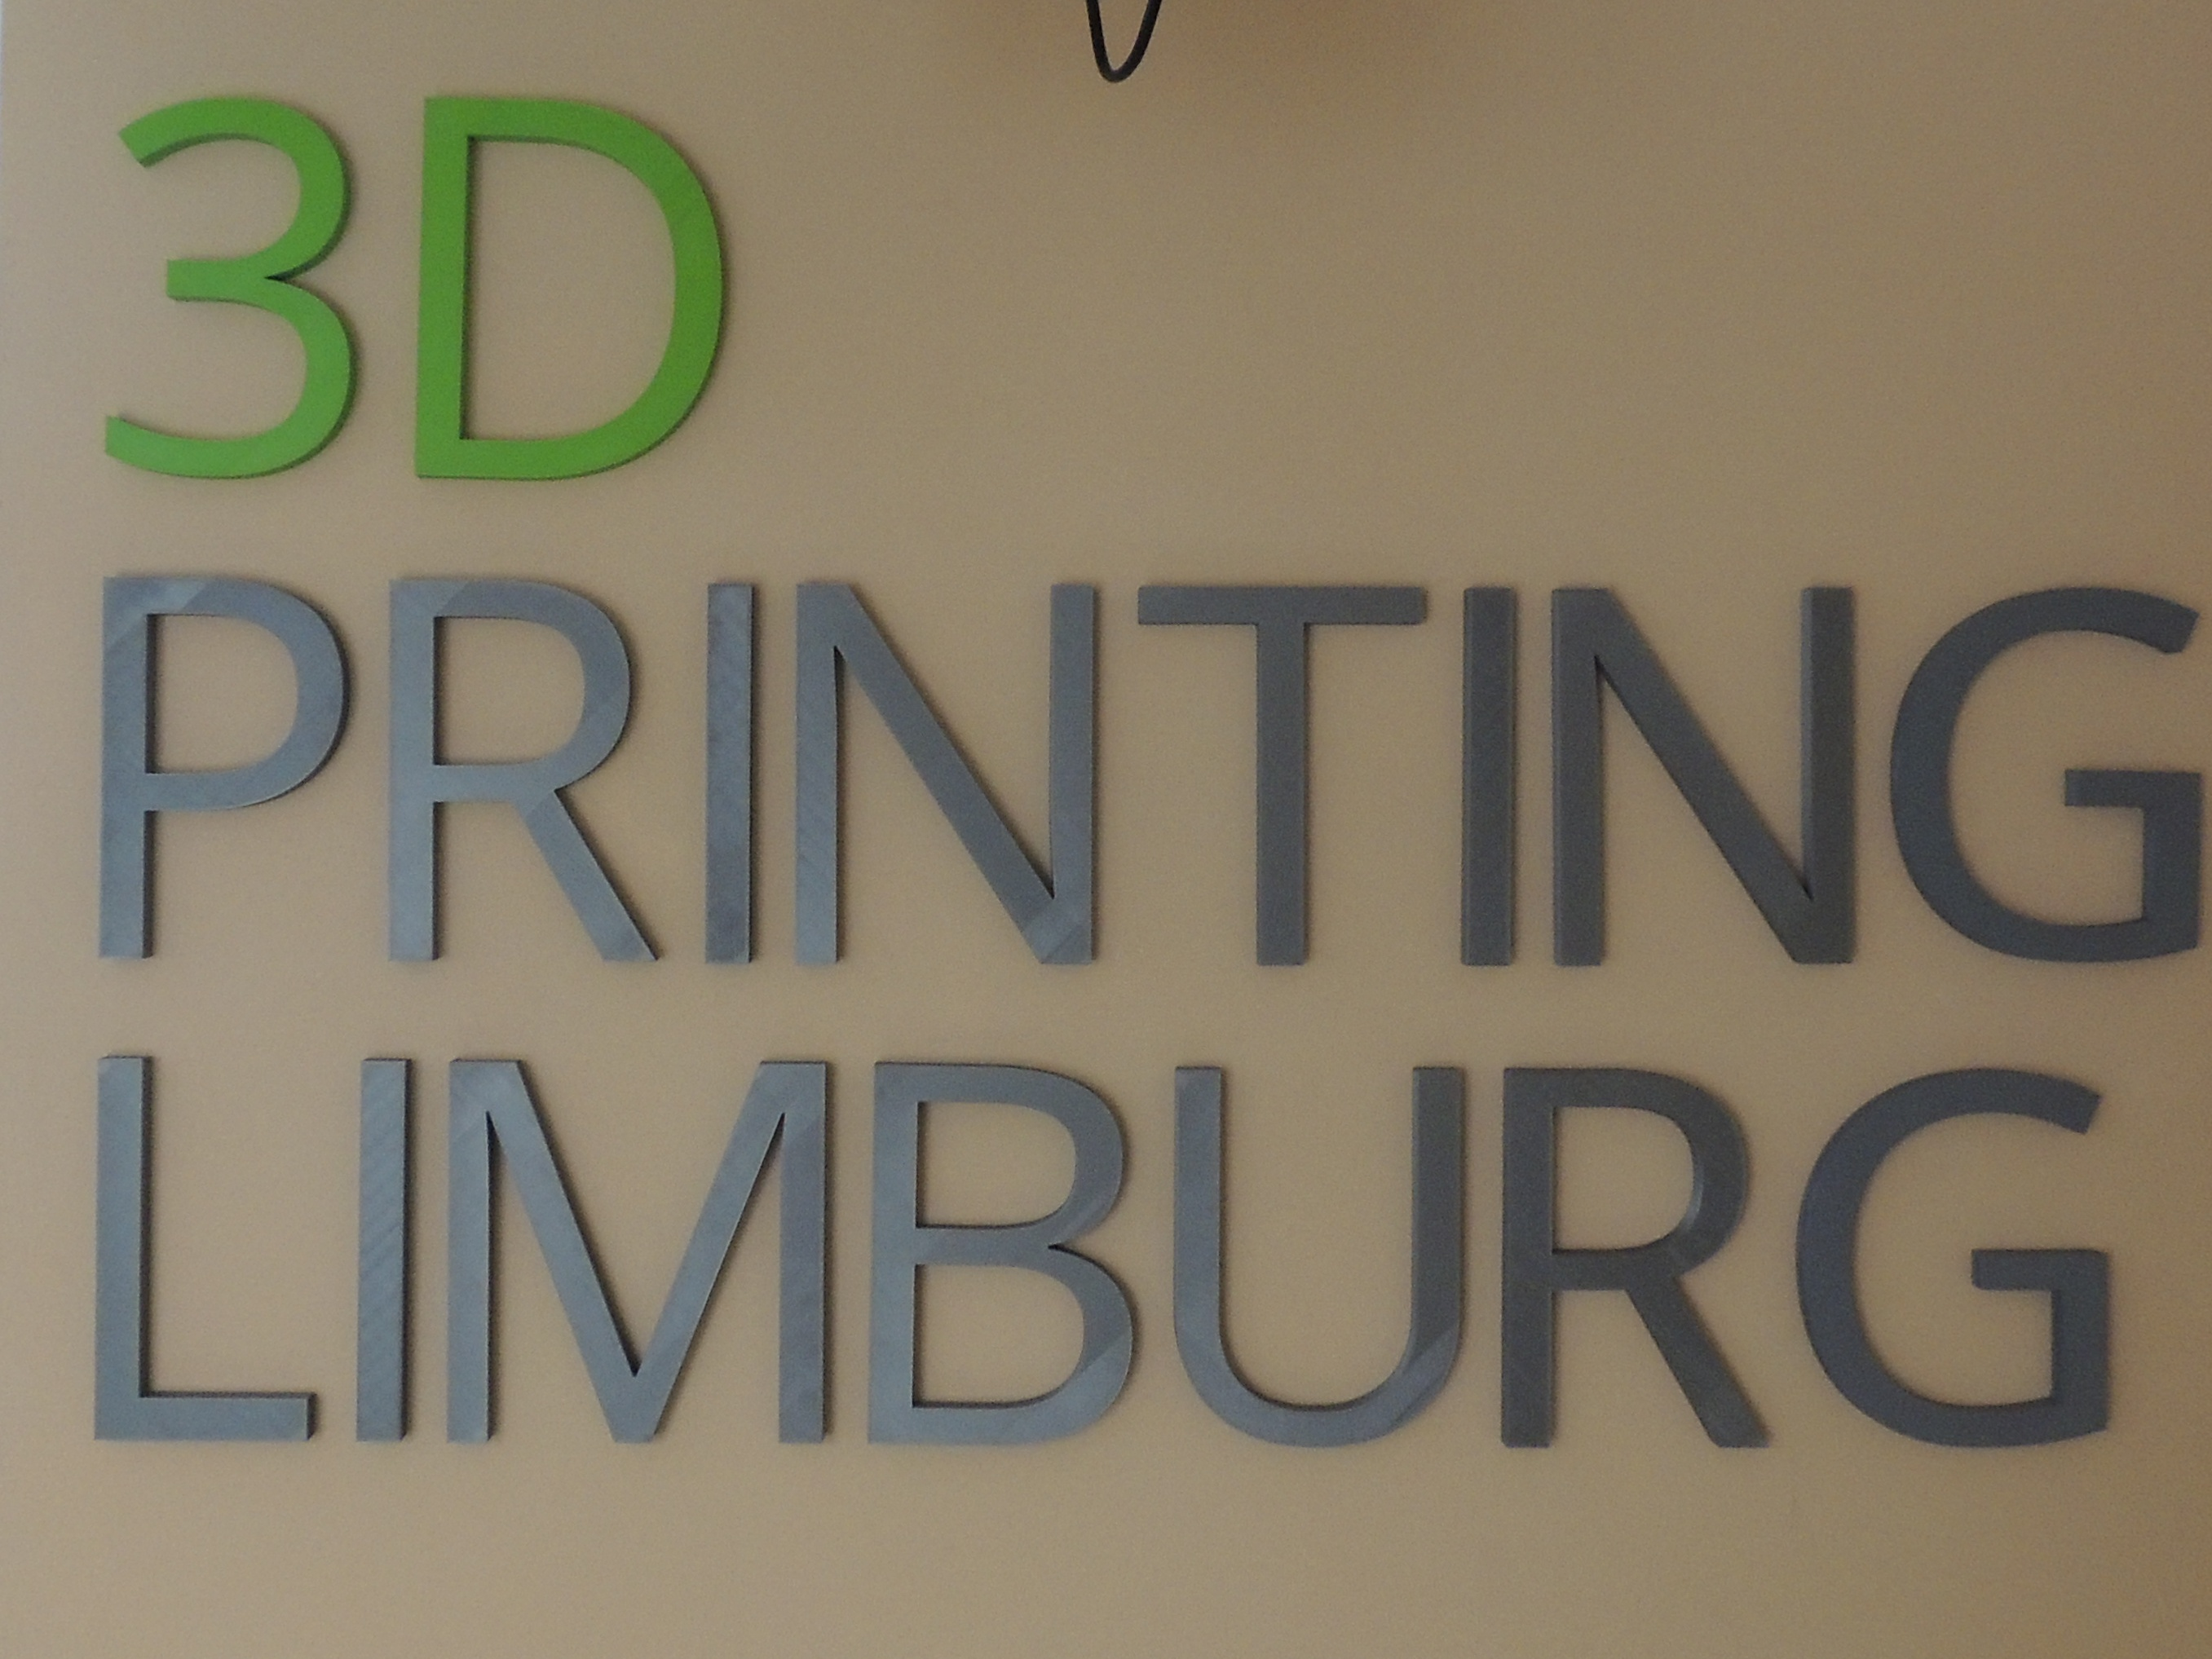 3D Printing Limburg | https://www.3dprintinglimburg.nl/files/afbeeldingen/portfolio/3DPLCropped.jpg